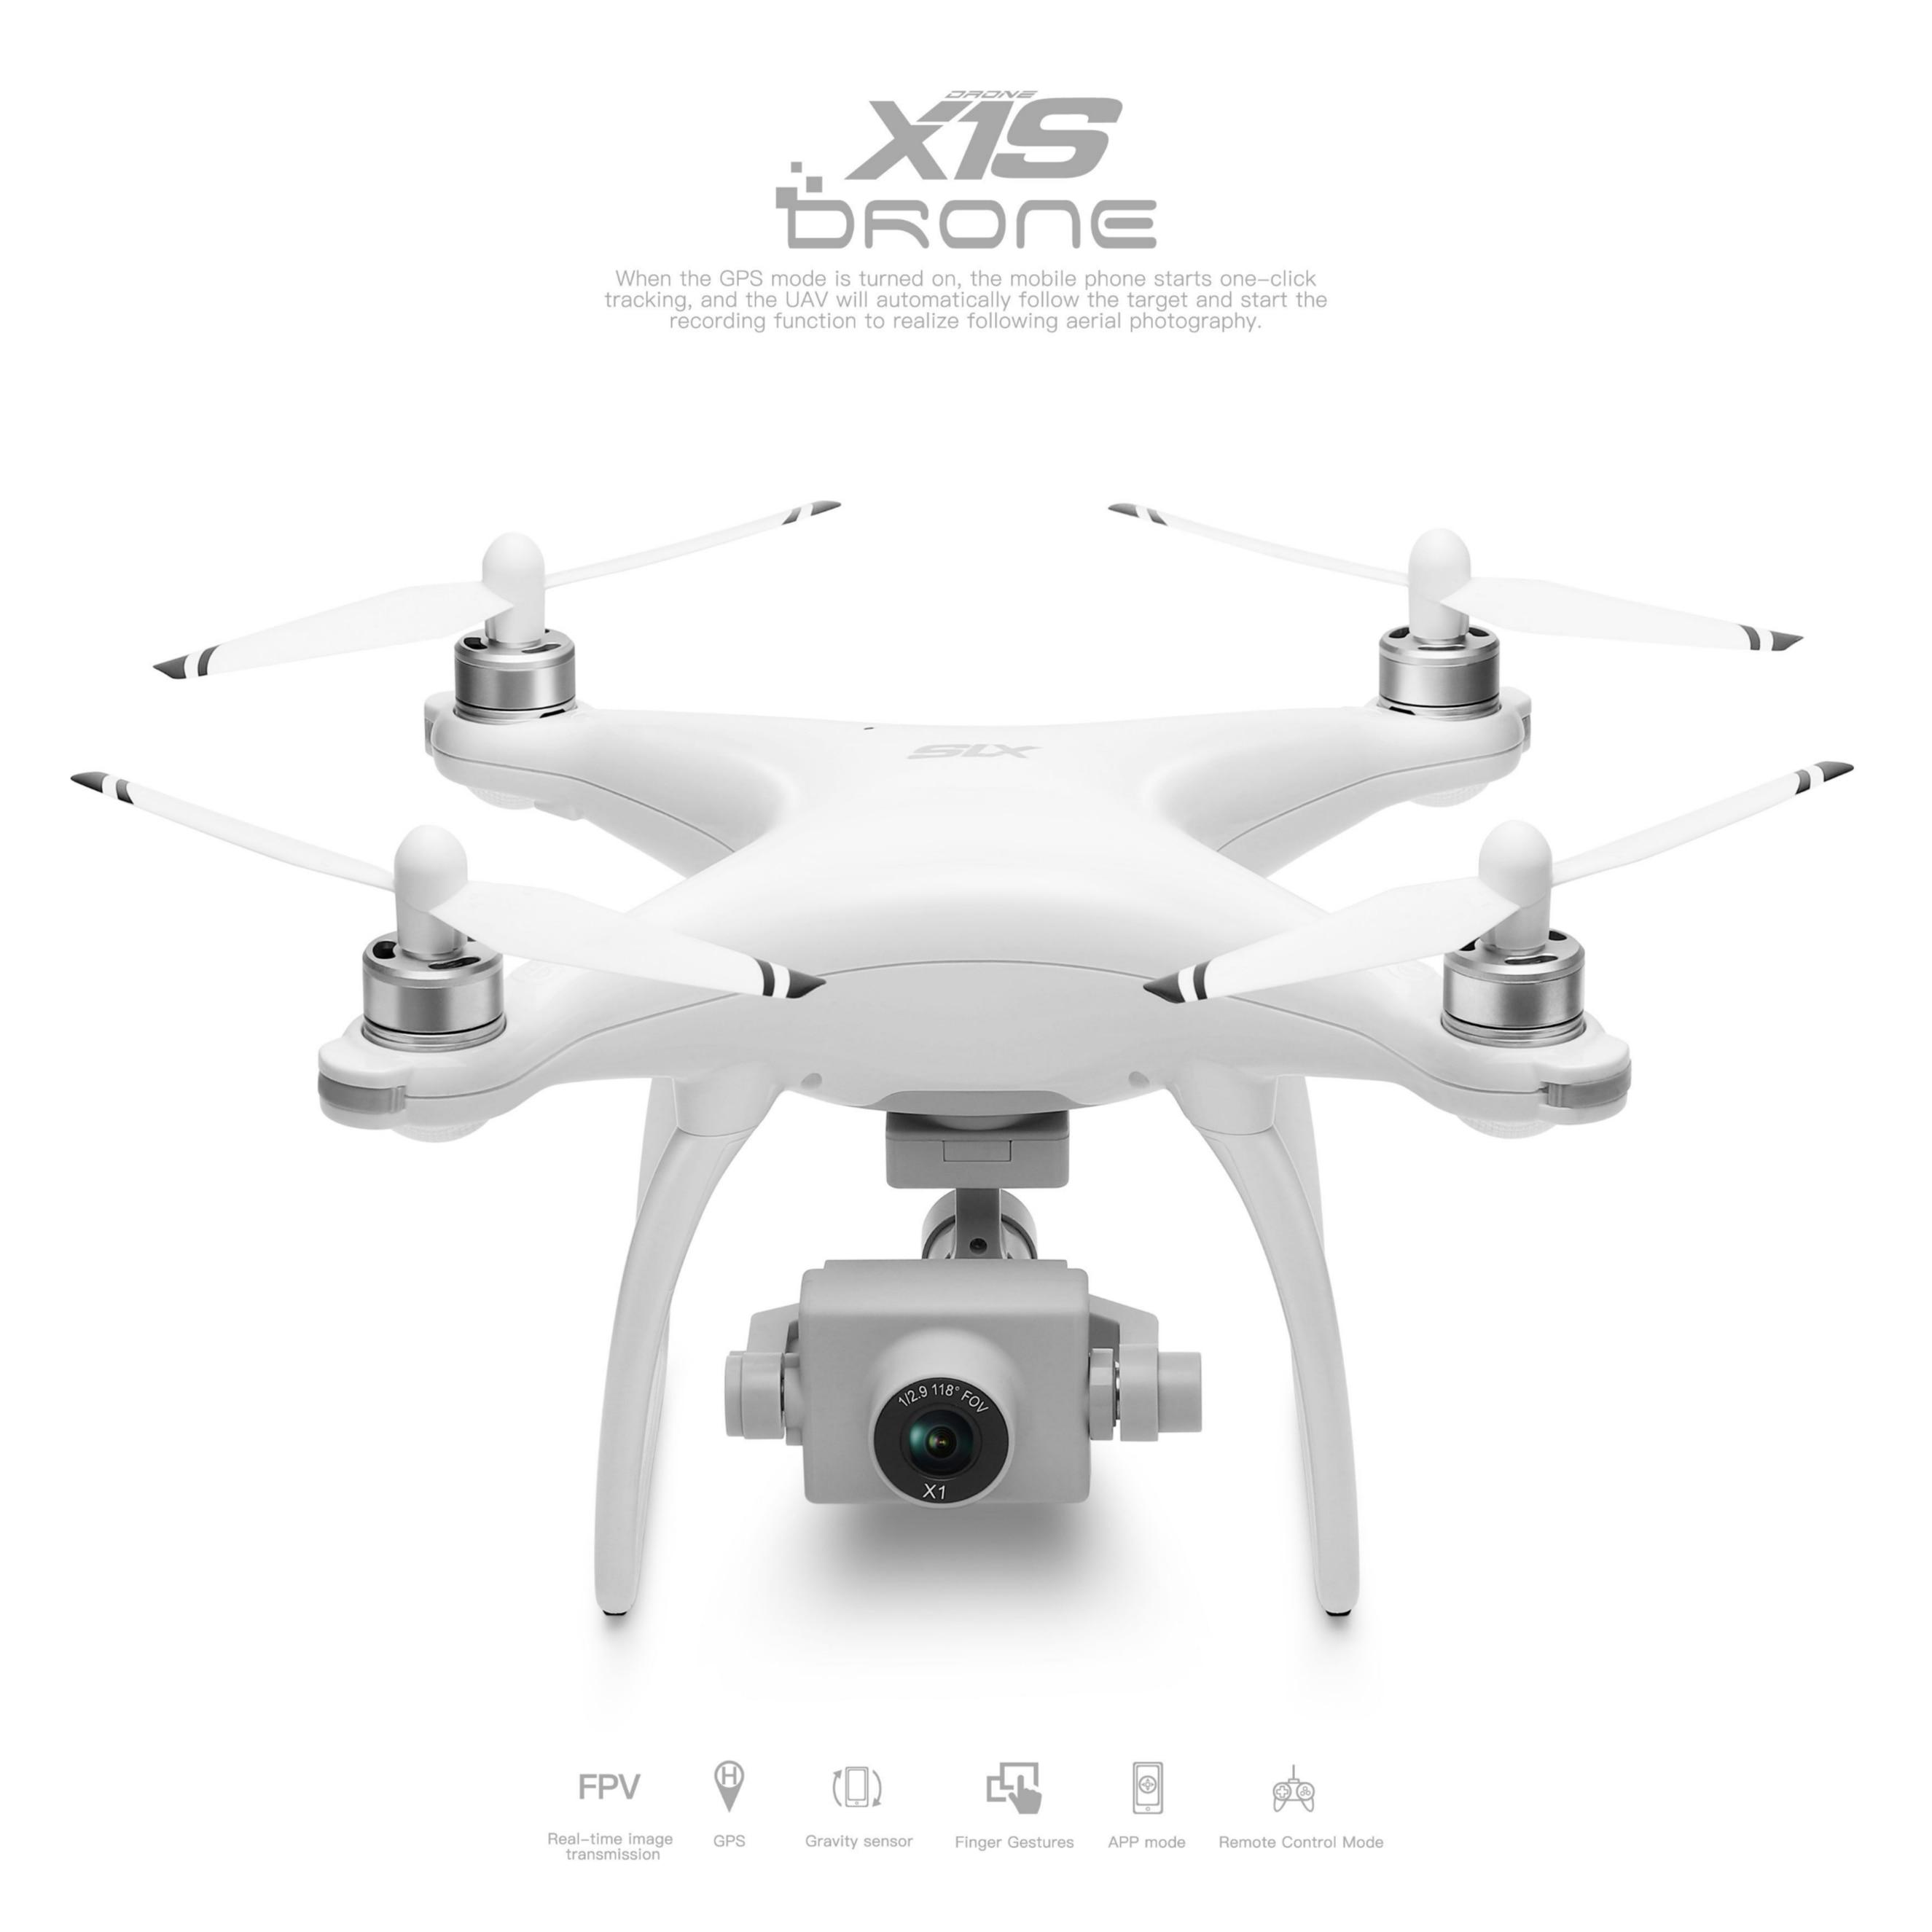 RC Drone 4K Kamera HD Fernbedienung Wi-Fi 1080P 5G FPV Wltoys X1s Control Professionelle Quad Copter fotografie Drone Spielzeug Geschenke